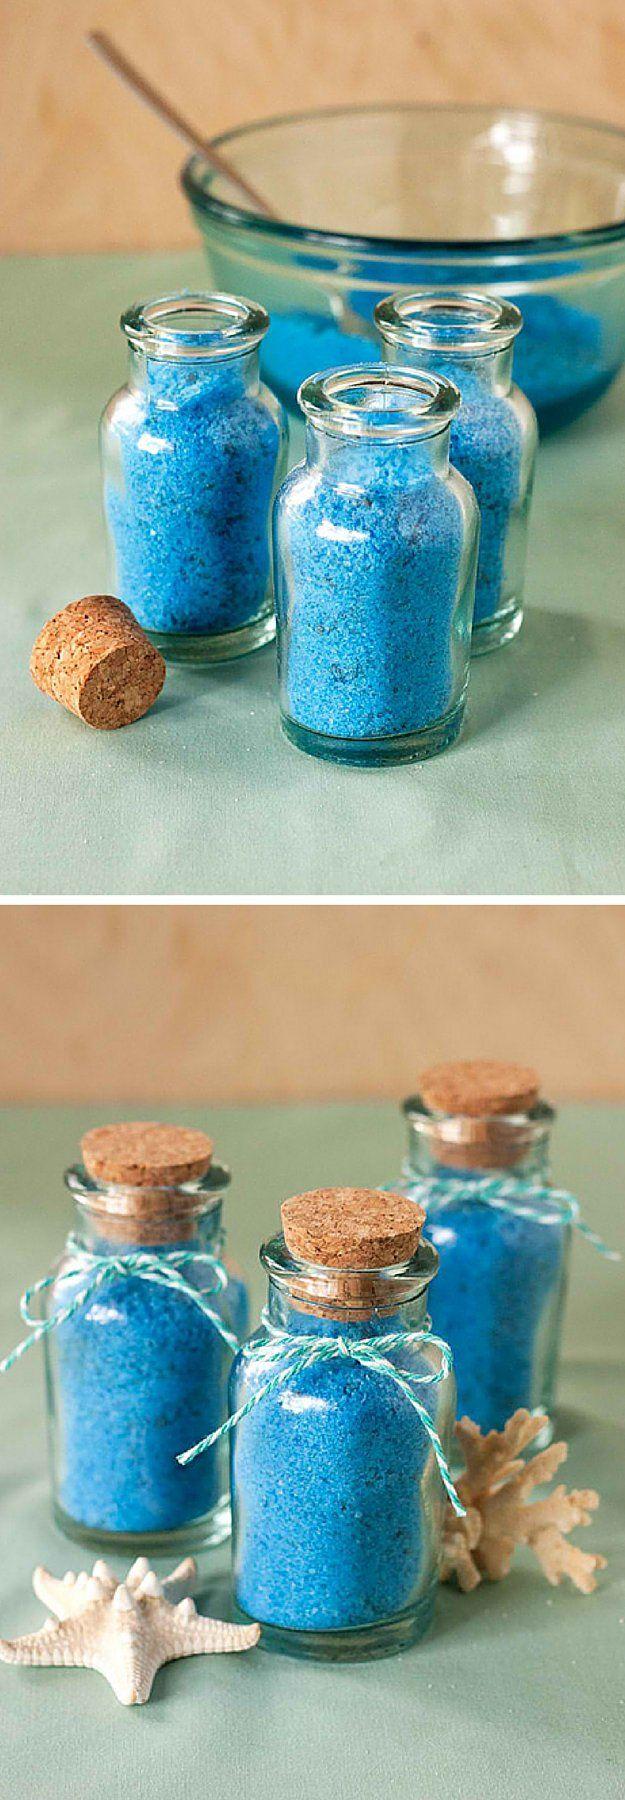 Mermaid Bath Salts|DIY Bath Salts